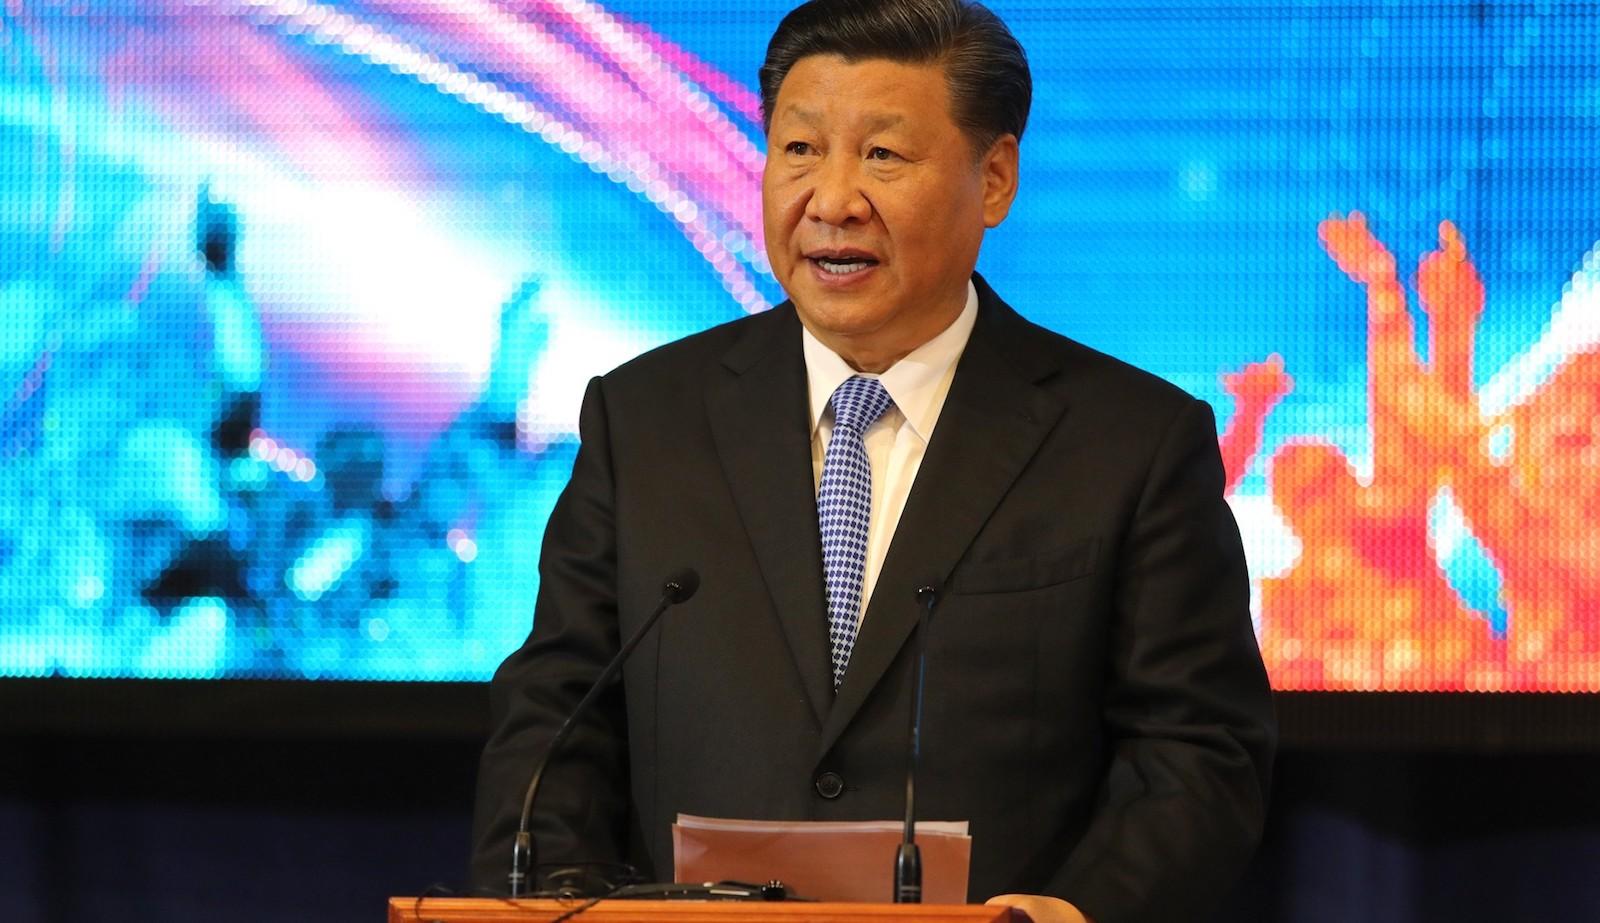 China's President Xi Jinping (Photo: Kremlin.ru)